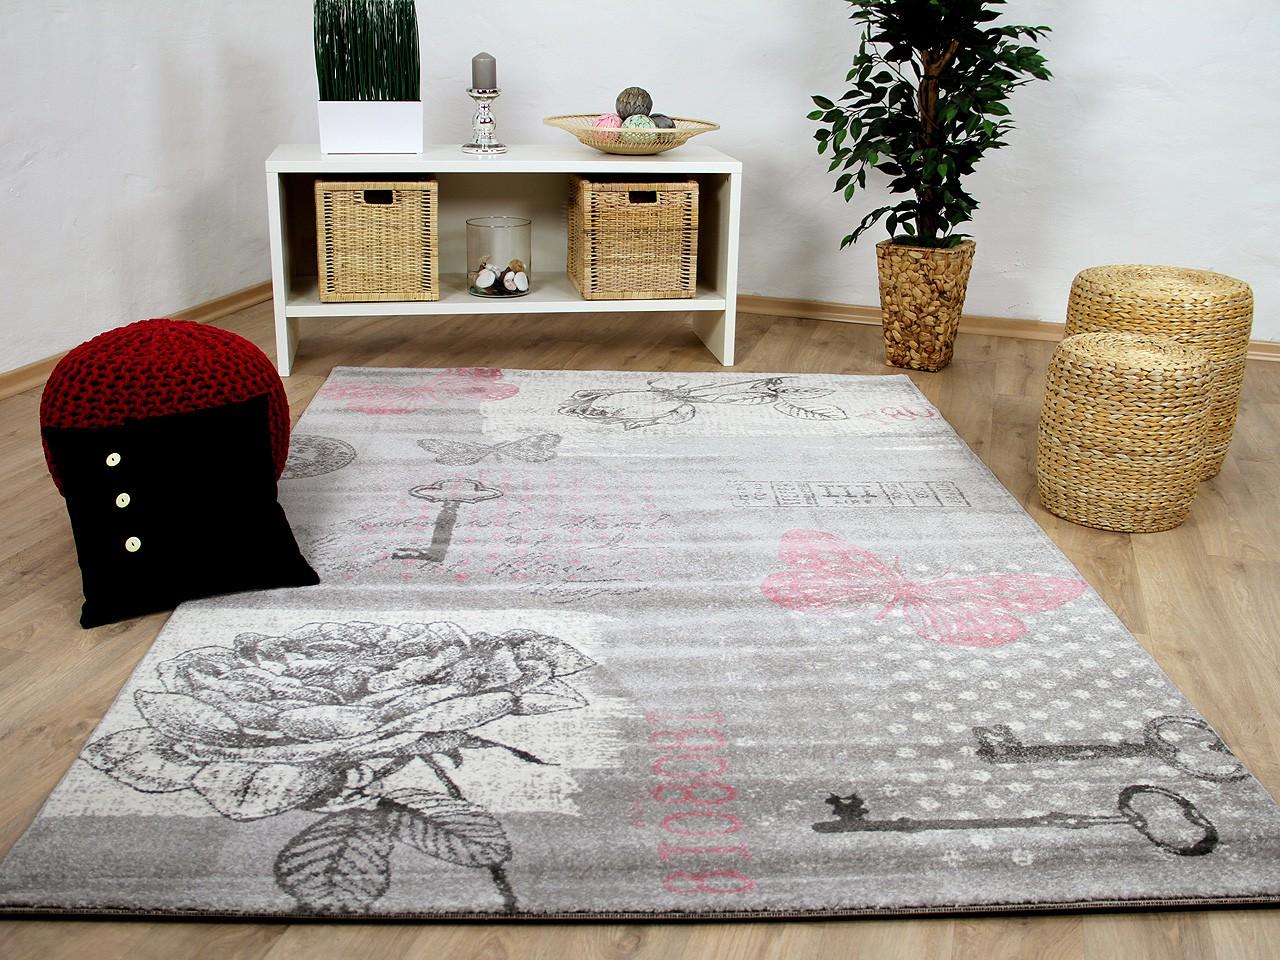 Designer Teppich Sevilla Klassik Grau Rosa Schmetterling Kaufen